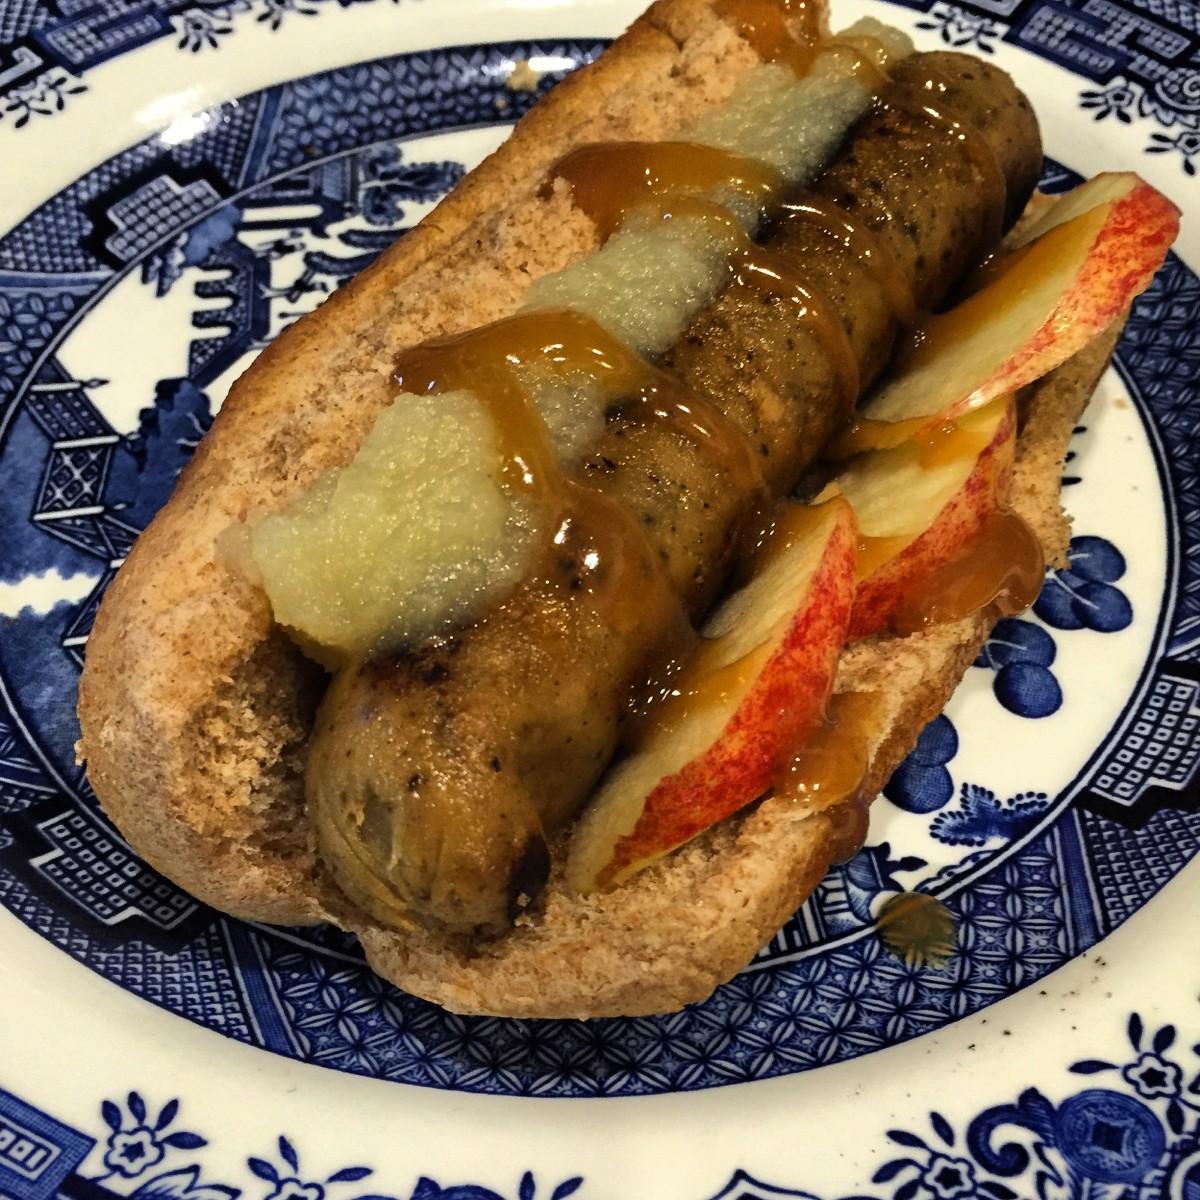 Gourmet Hot Dog: The Big Apple